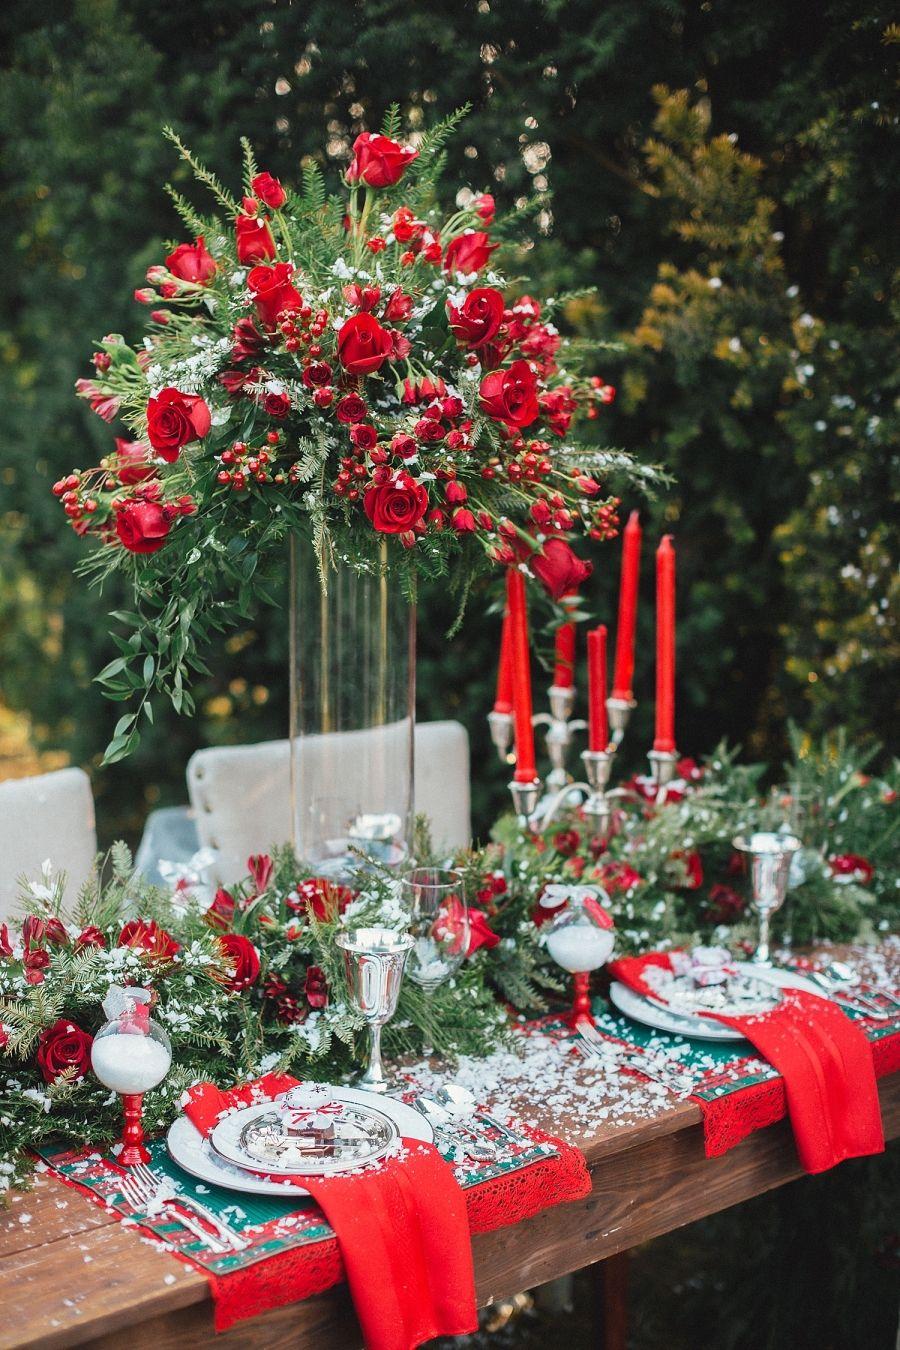 bluebird christmas tree farm inspiration shoot - Bluebird Christmas Tree Farm